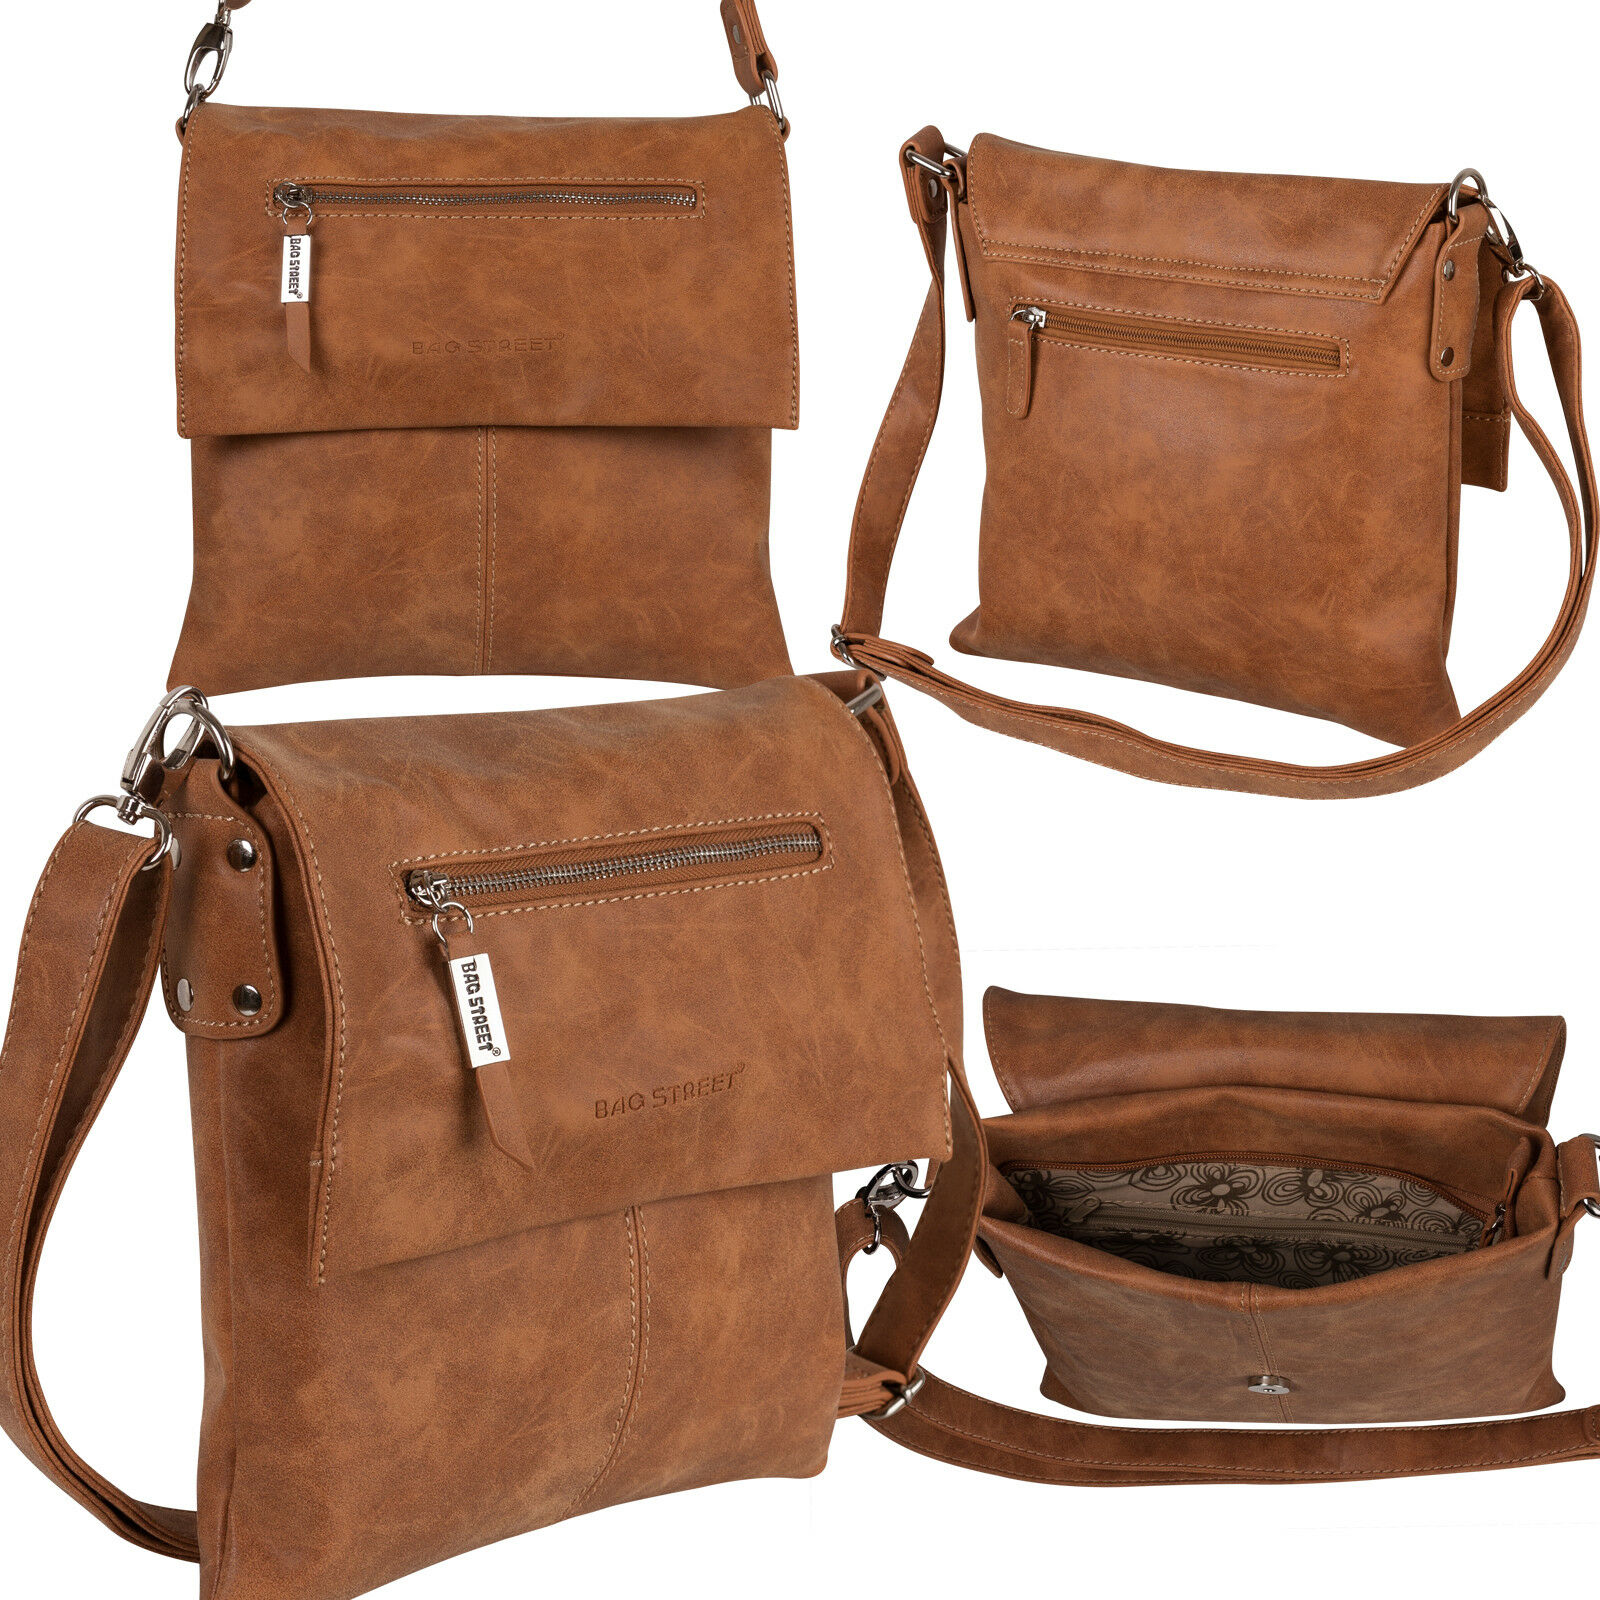 Bag Street Damentasche Umhängetasche Handtasche Schultertasche K2 T0102 Cognac